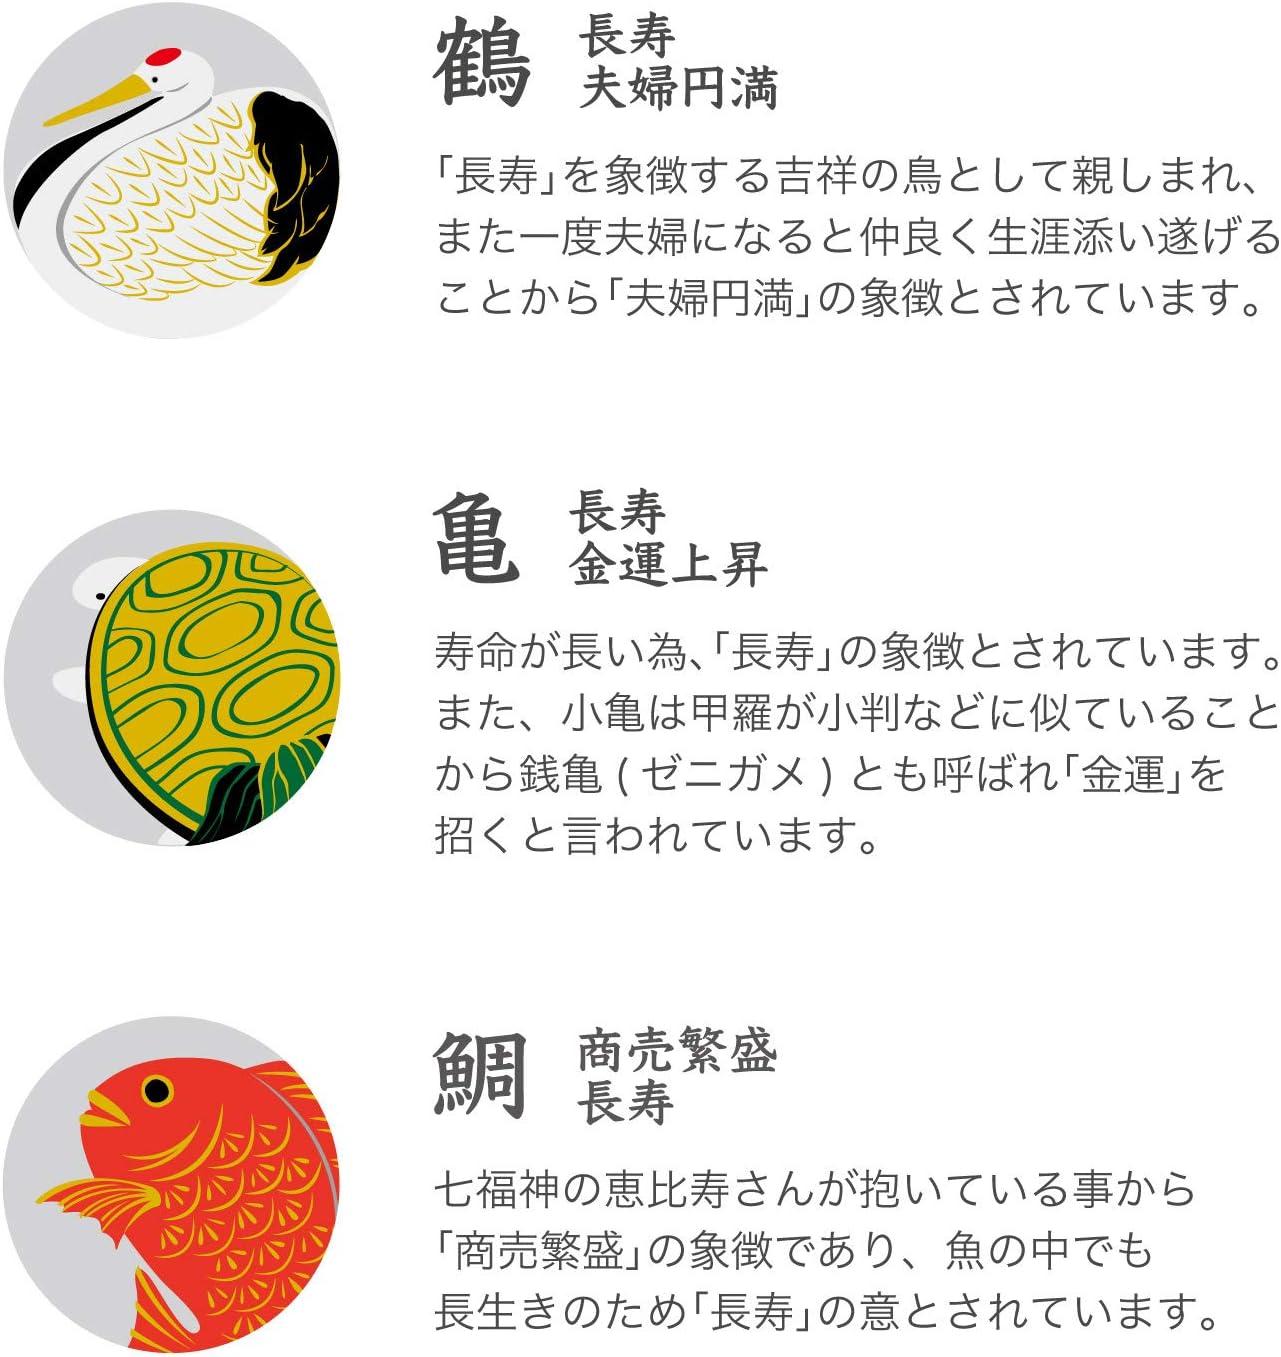 ADERIA(アデリア)「めでたmono 福寿 豆皿鶴亀鯛セット」